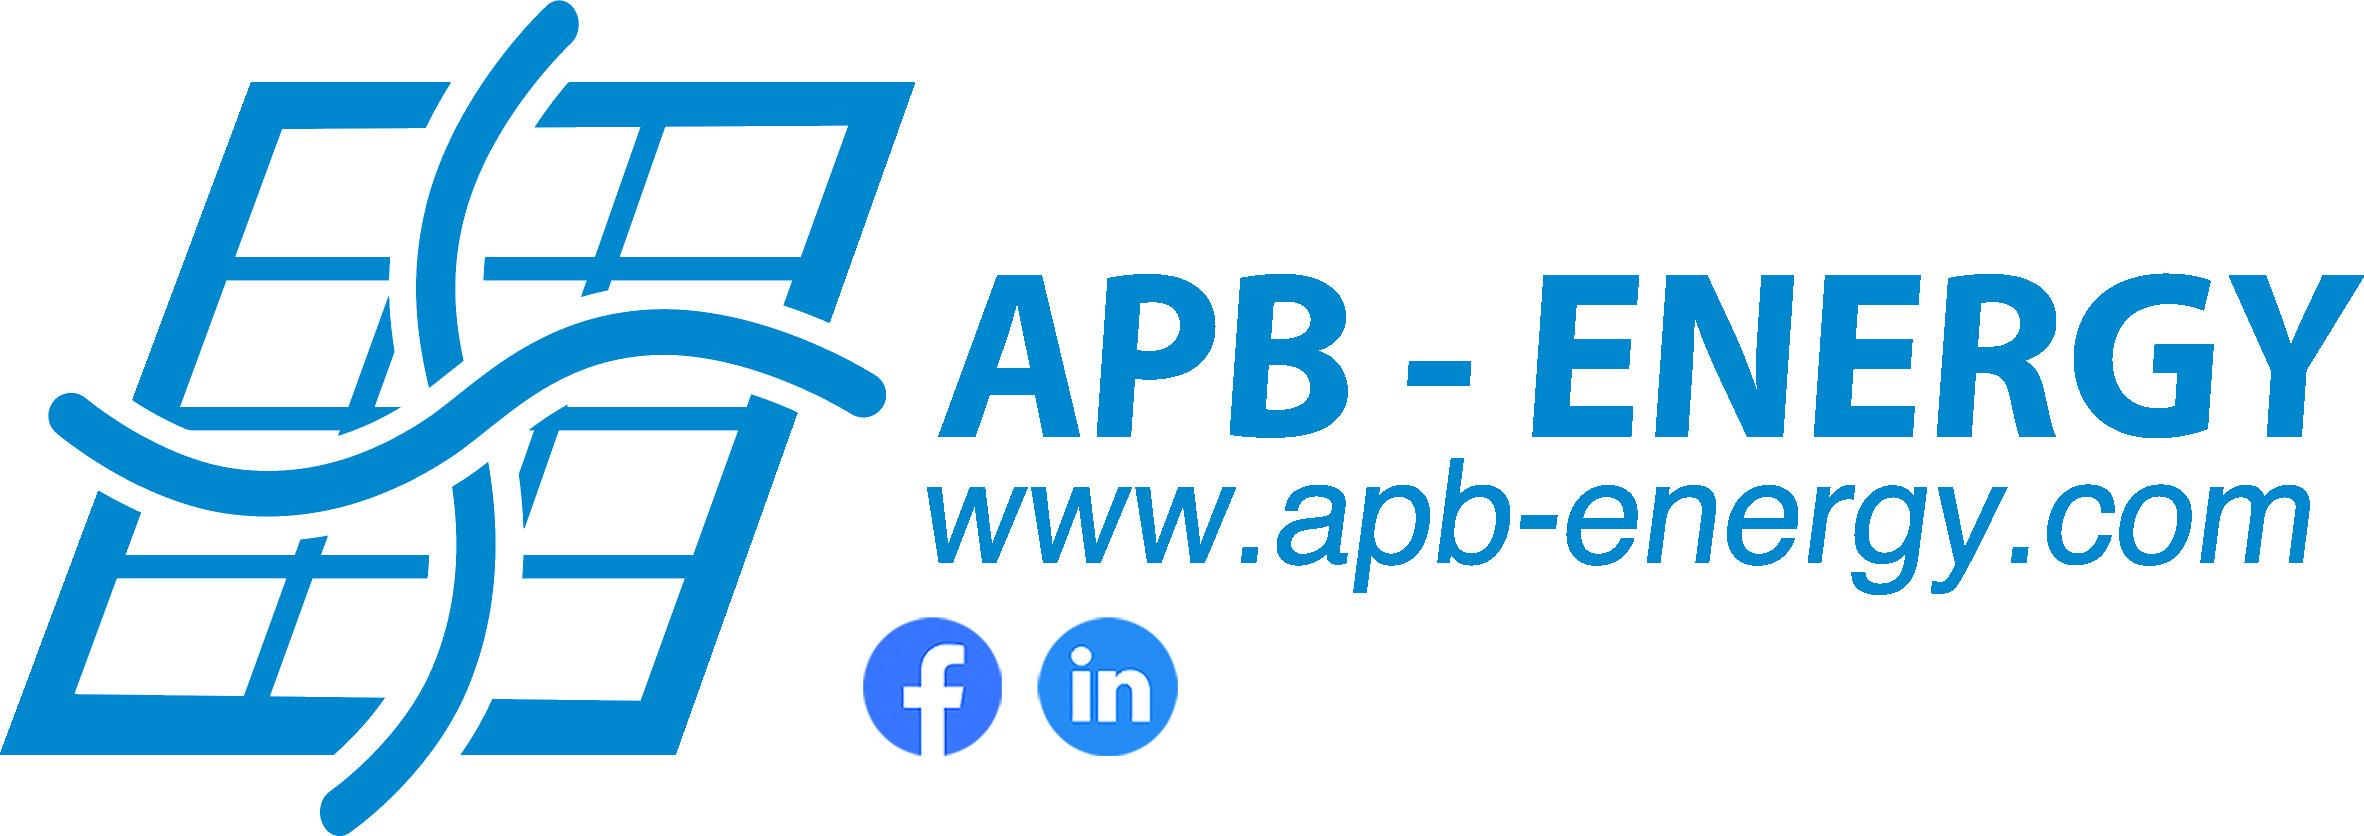 APB ENERGY